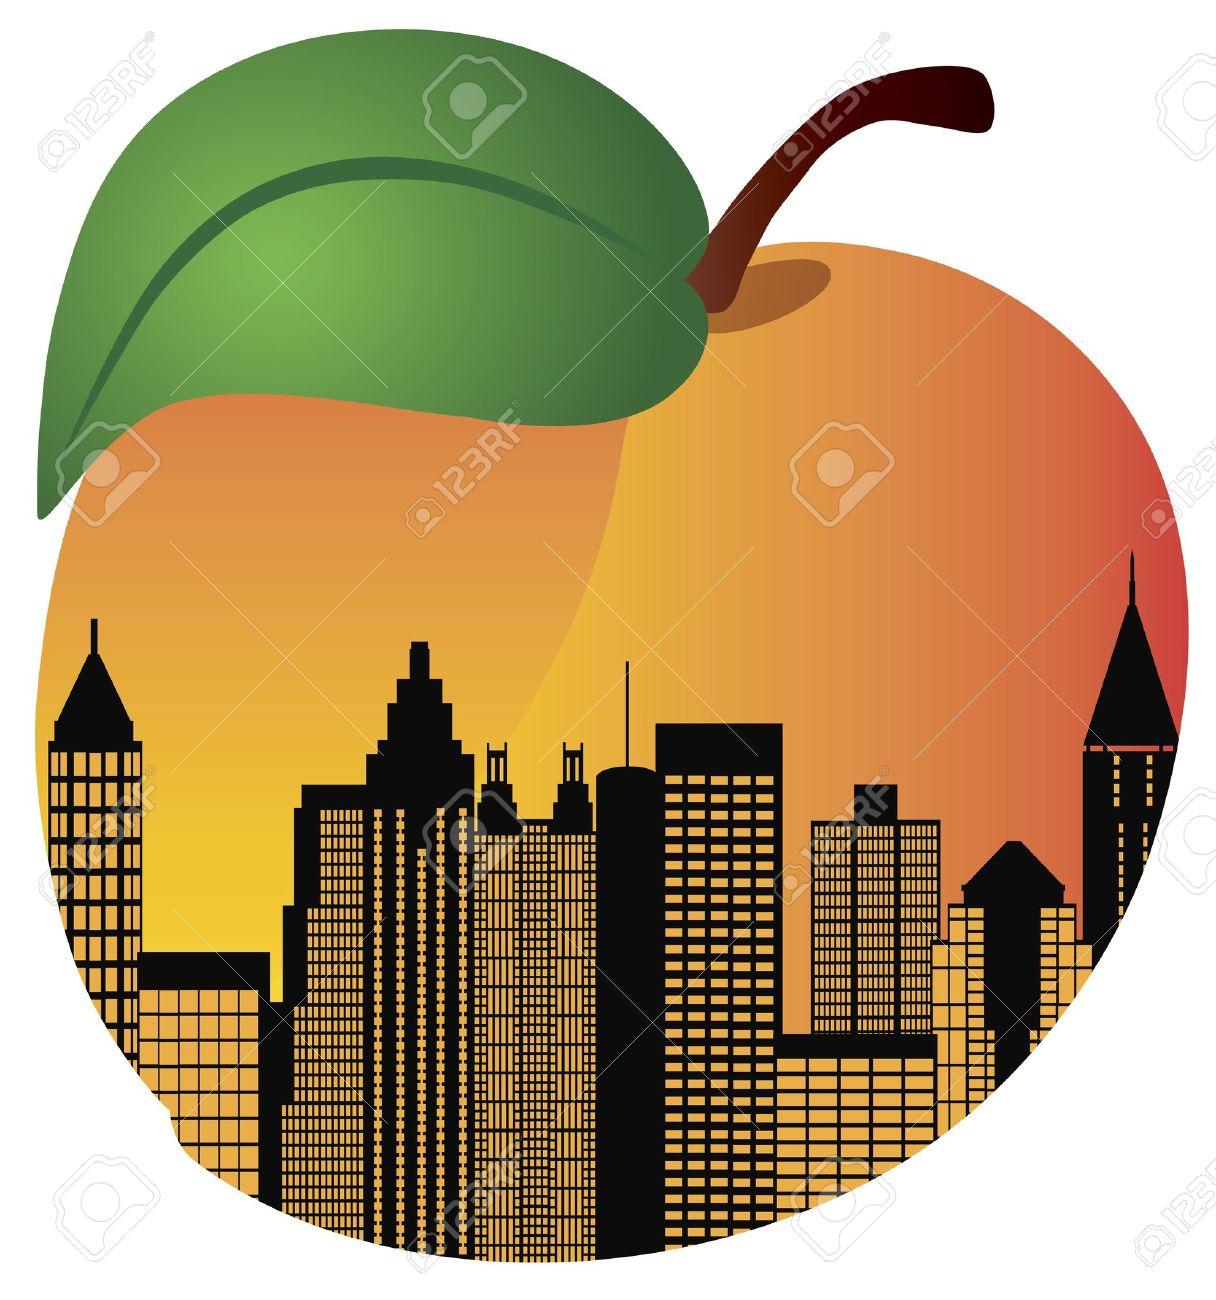 Atlanta Georgia City Skyline Night Silhouette Inside Peach Fruit Illustration Stock Vector - 14461406